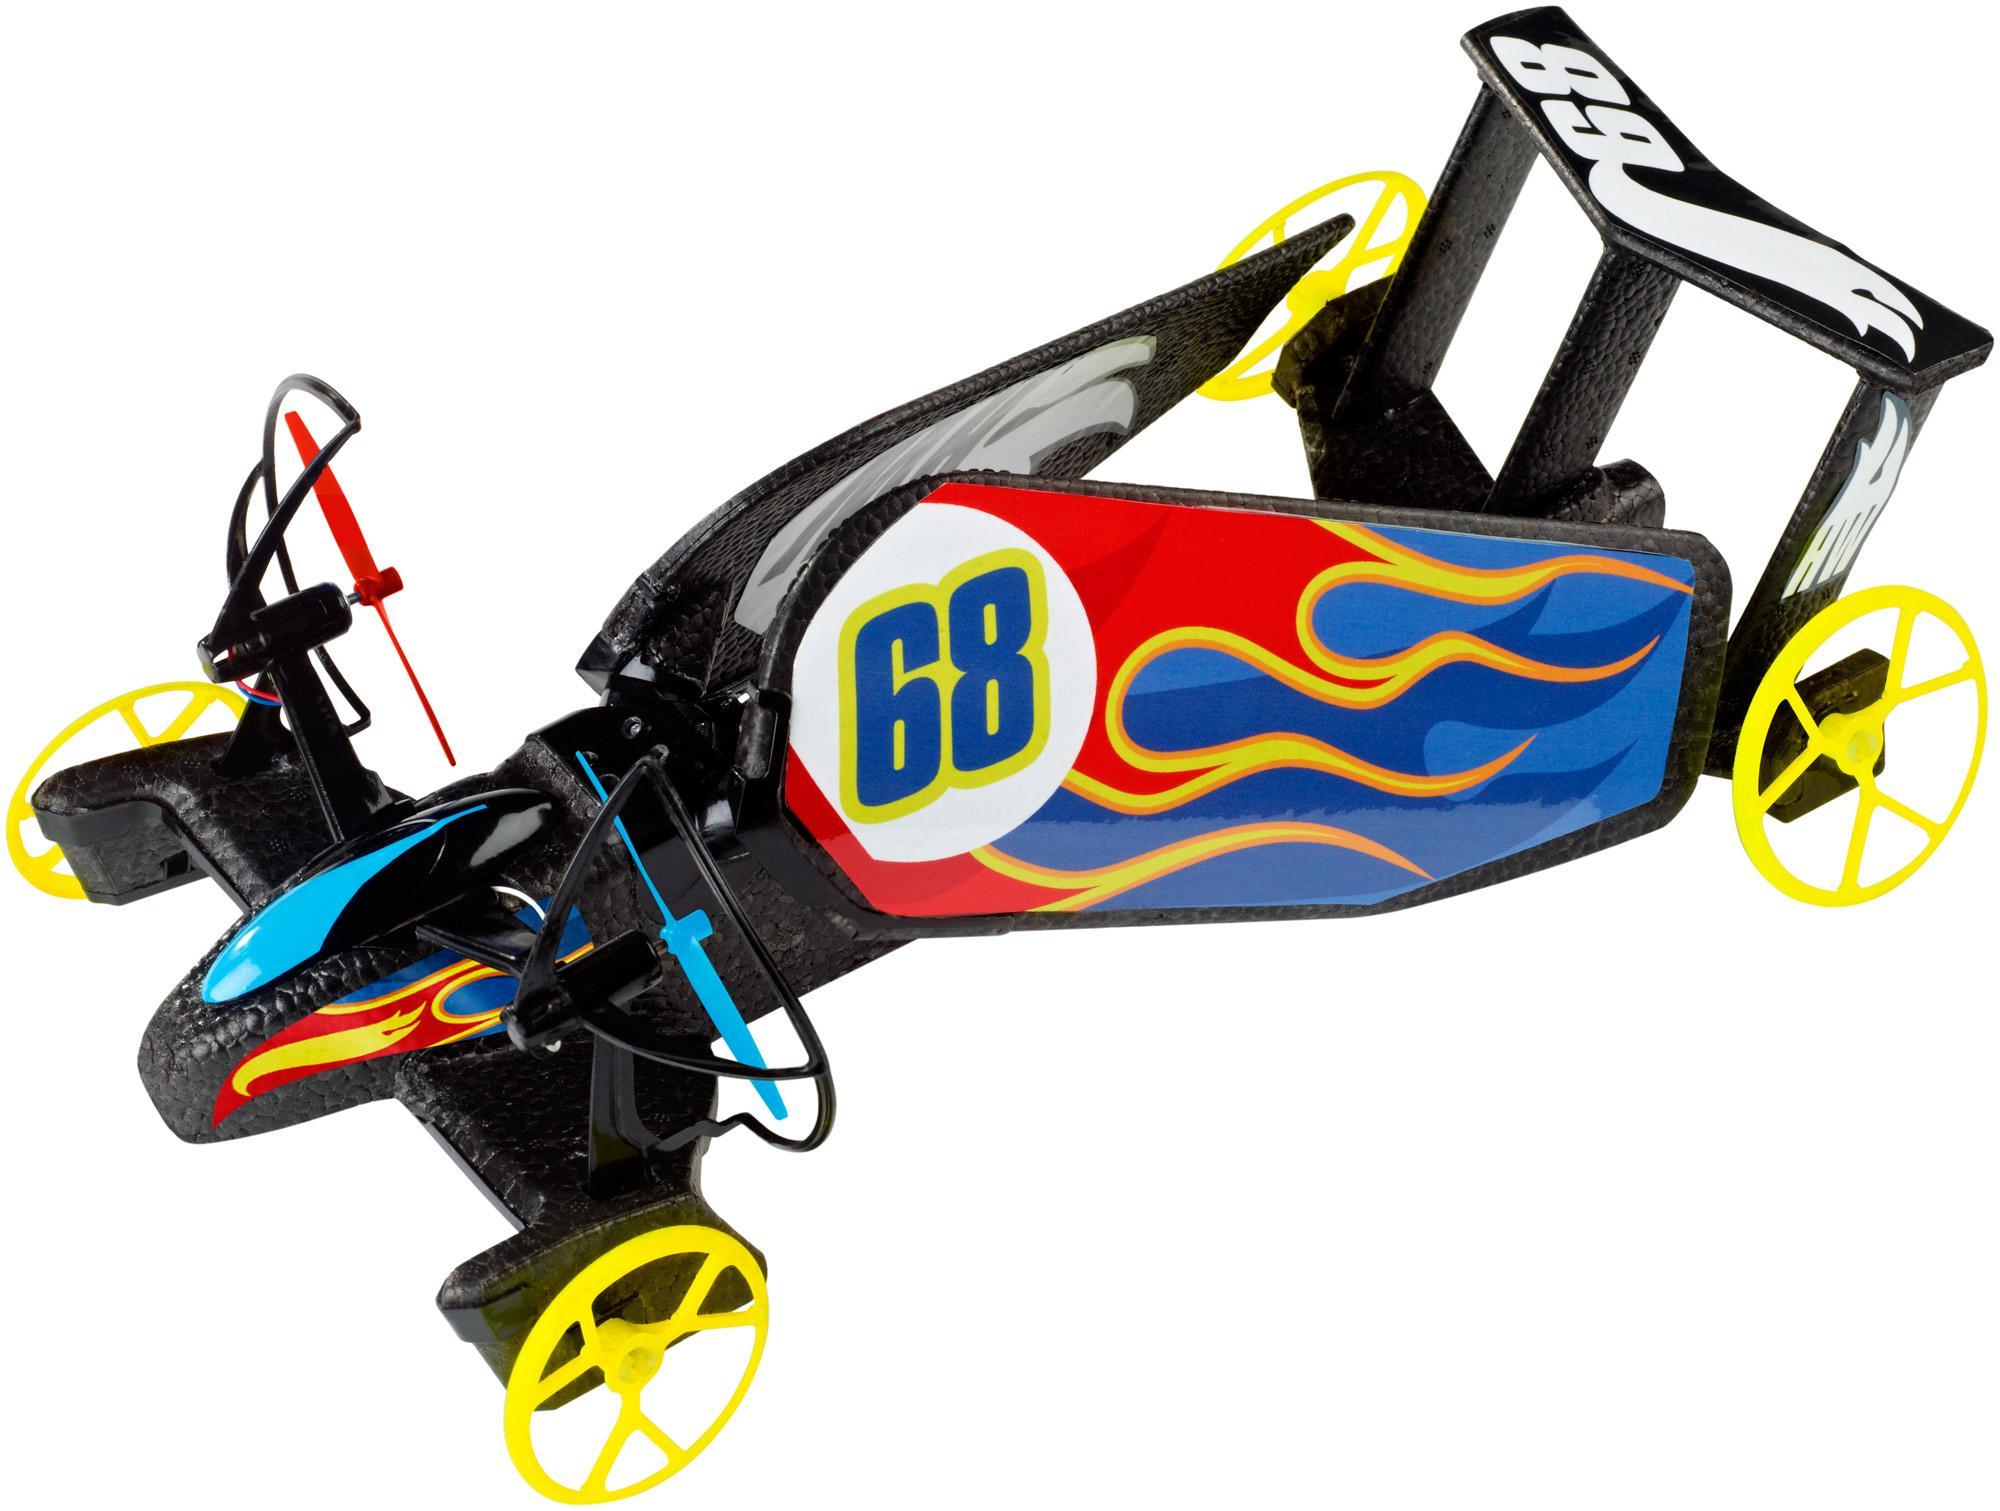 Hot Wheels Toys : Amazon hot wheels sky shock rc flame design toys